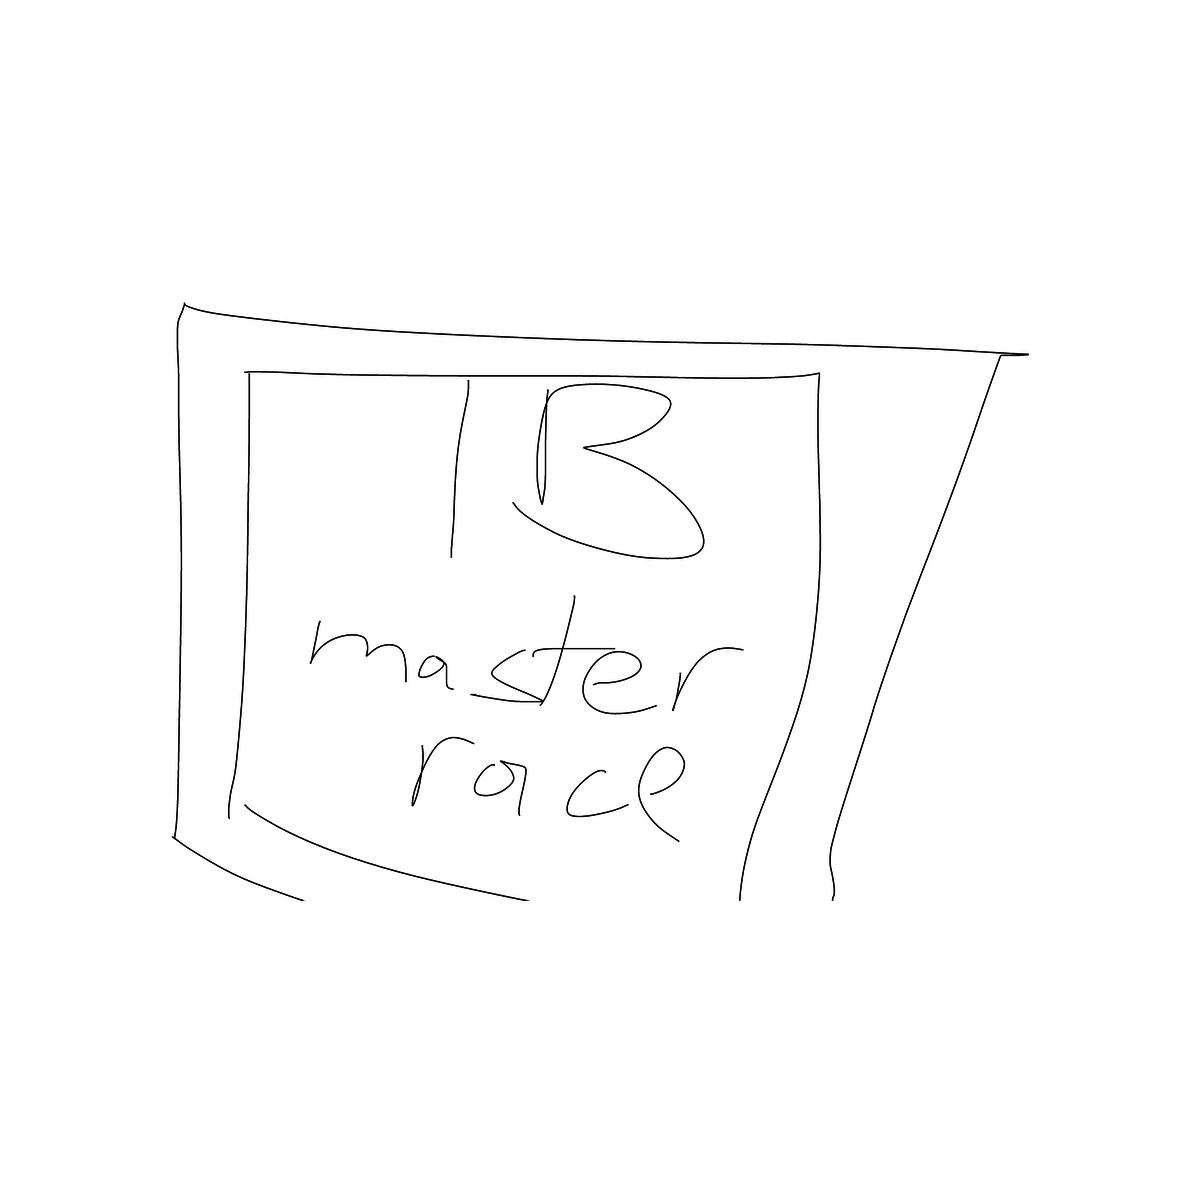 BAAAM drawing#6014 lat:55.9343757629394500lng: 23.3105278015136720